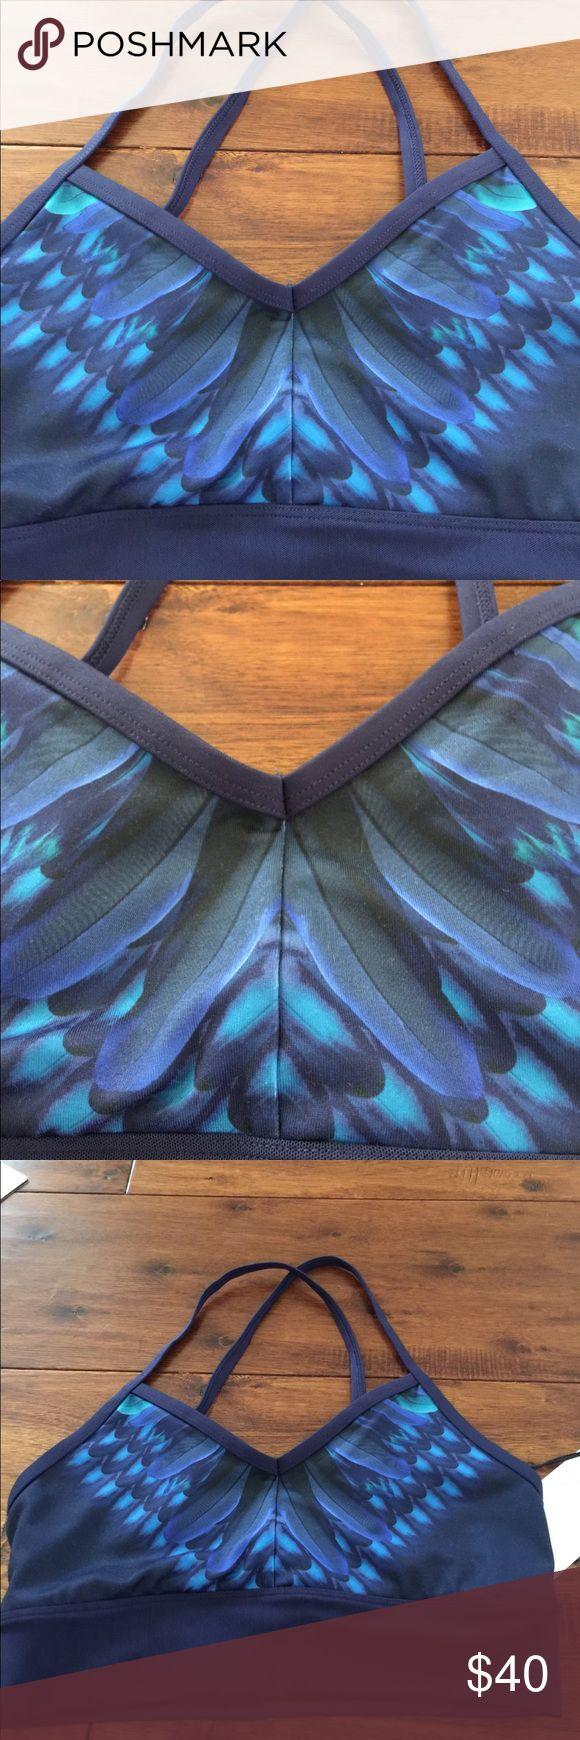 Alo Gypset Goddess Bra Beautiful design! Alo bra! Super cute!! Adjustable straps. ALO Yoga Intimates & Sleepwear Bras